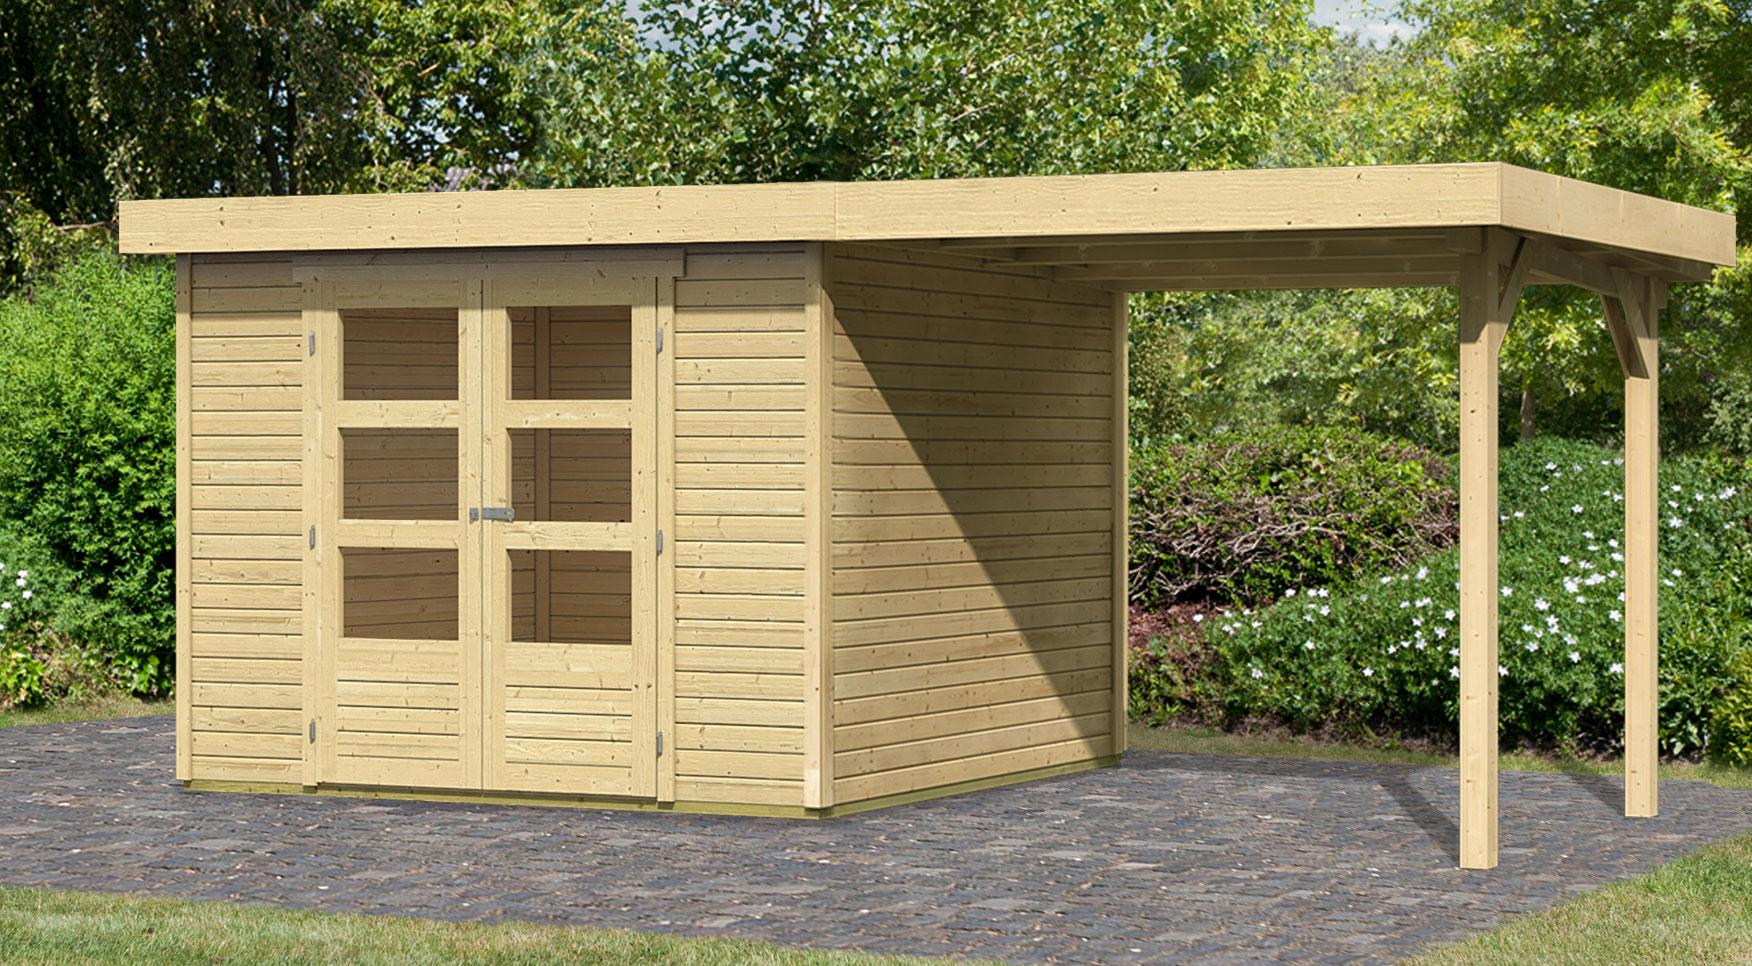 woodfeeling gartenhaus 19mm askola 4 natur 329x237cm schleppdach bei. Black Bedroom Furniture Sets. Home Design Ideas